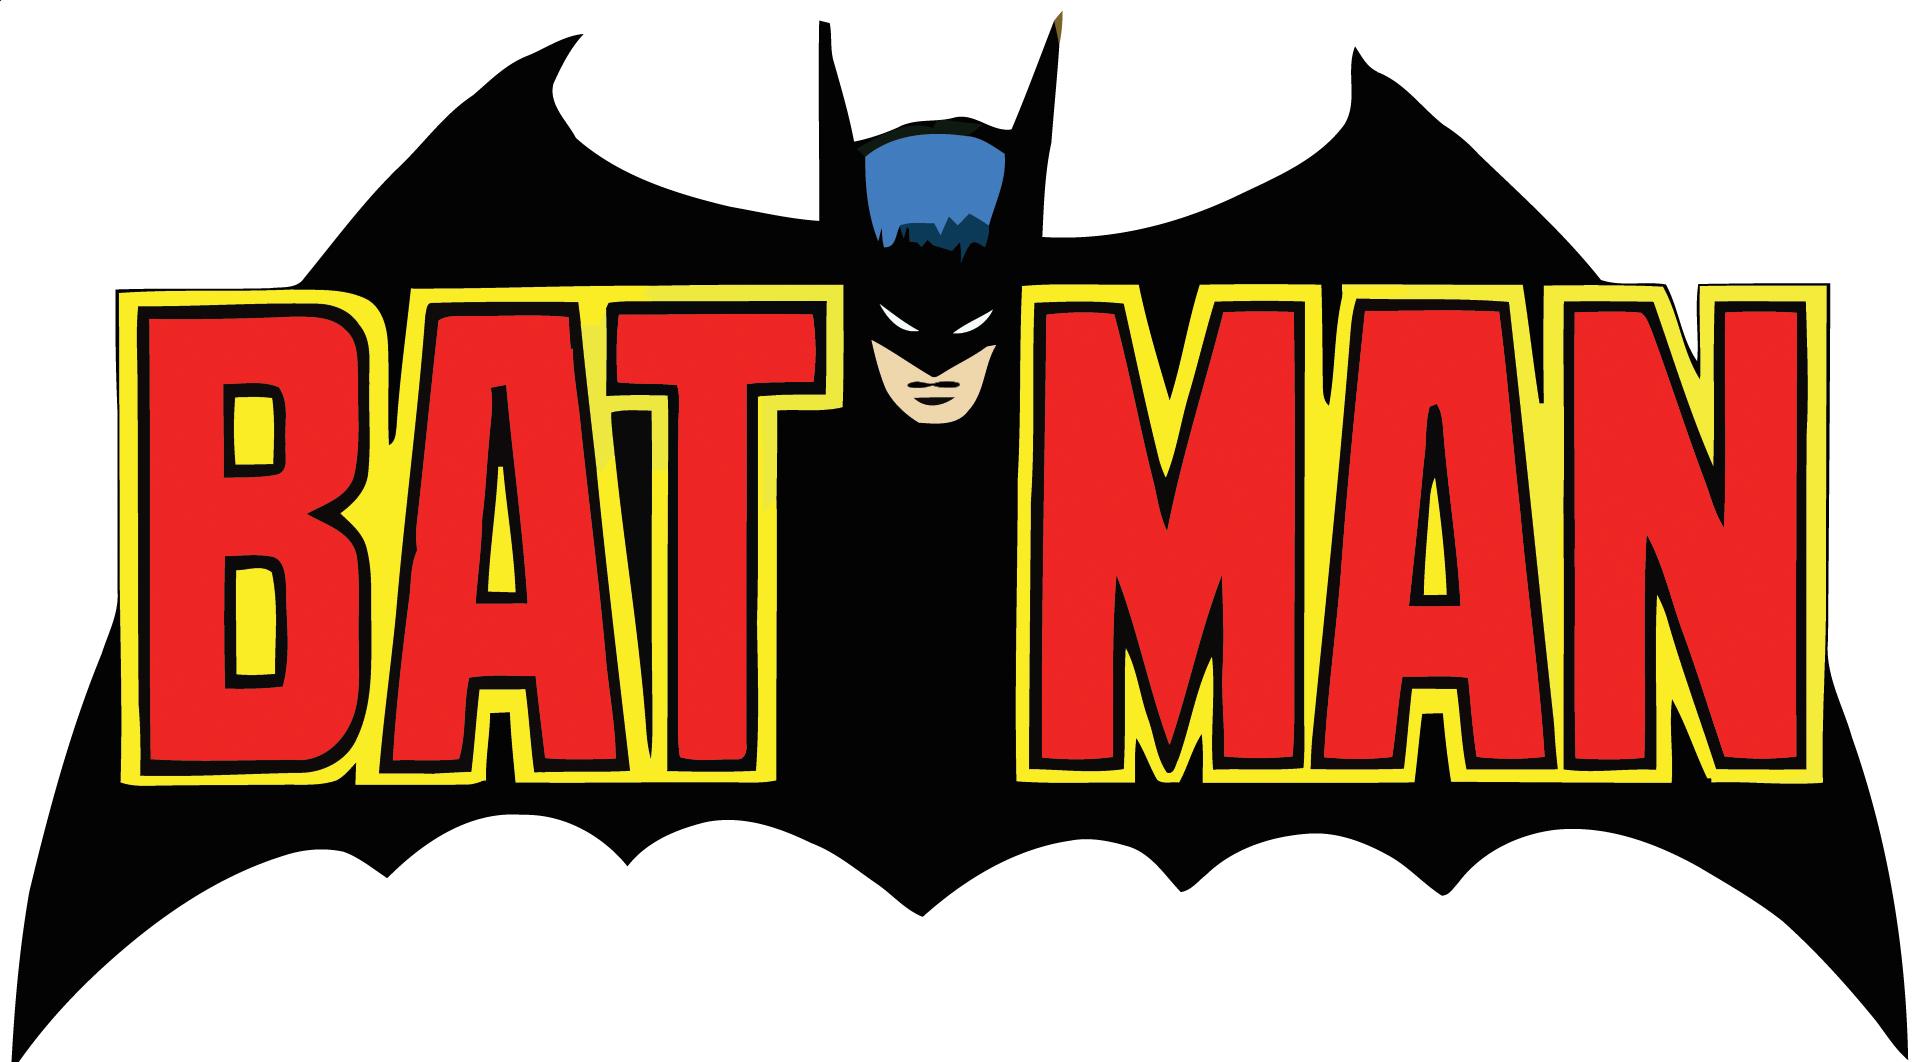 Classic batman logos